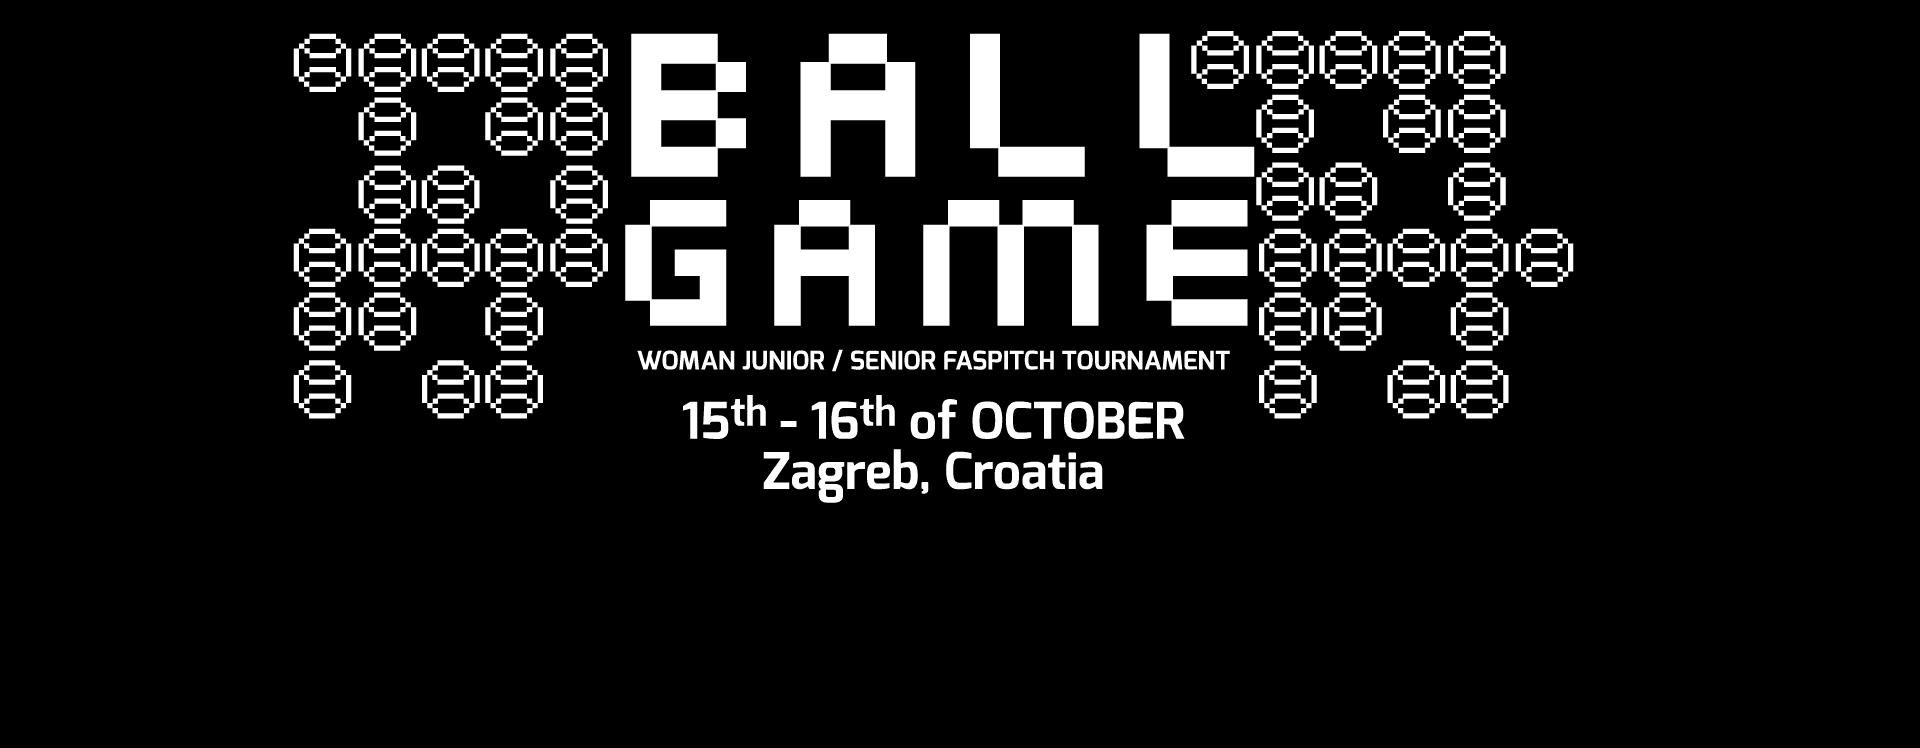 ball-game-pozadina-1